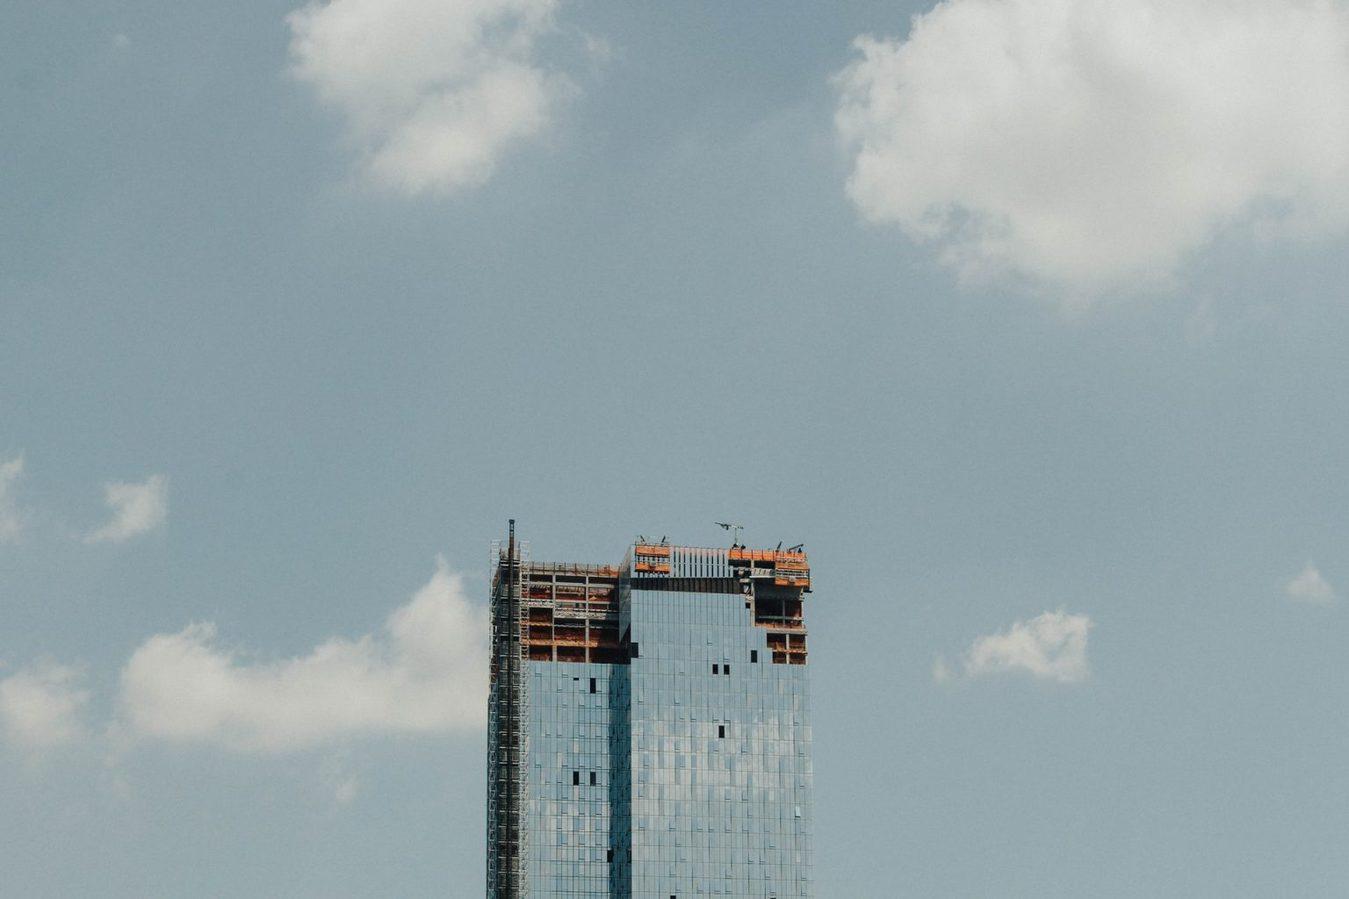 Unfinished scyscraper